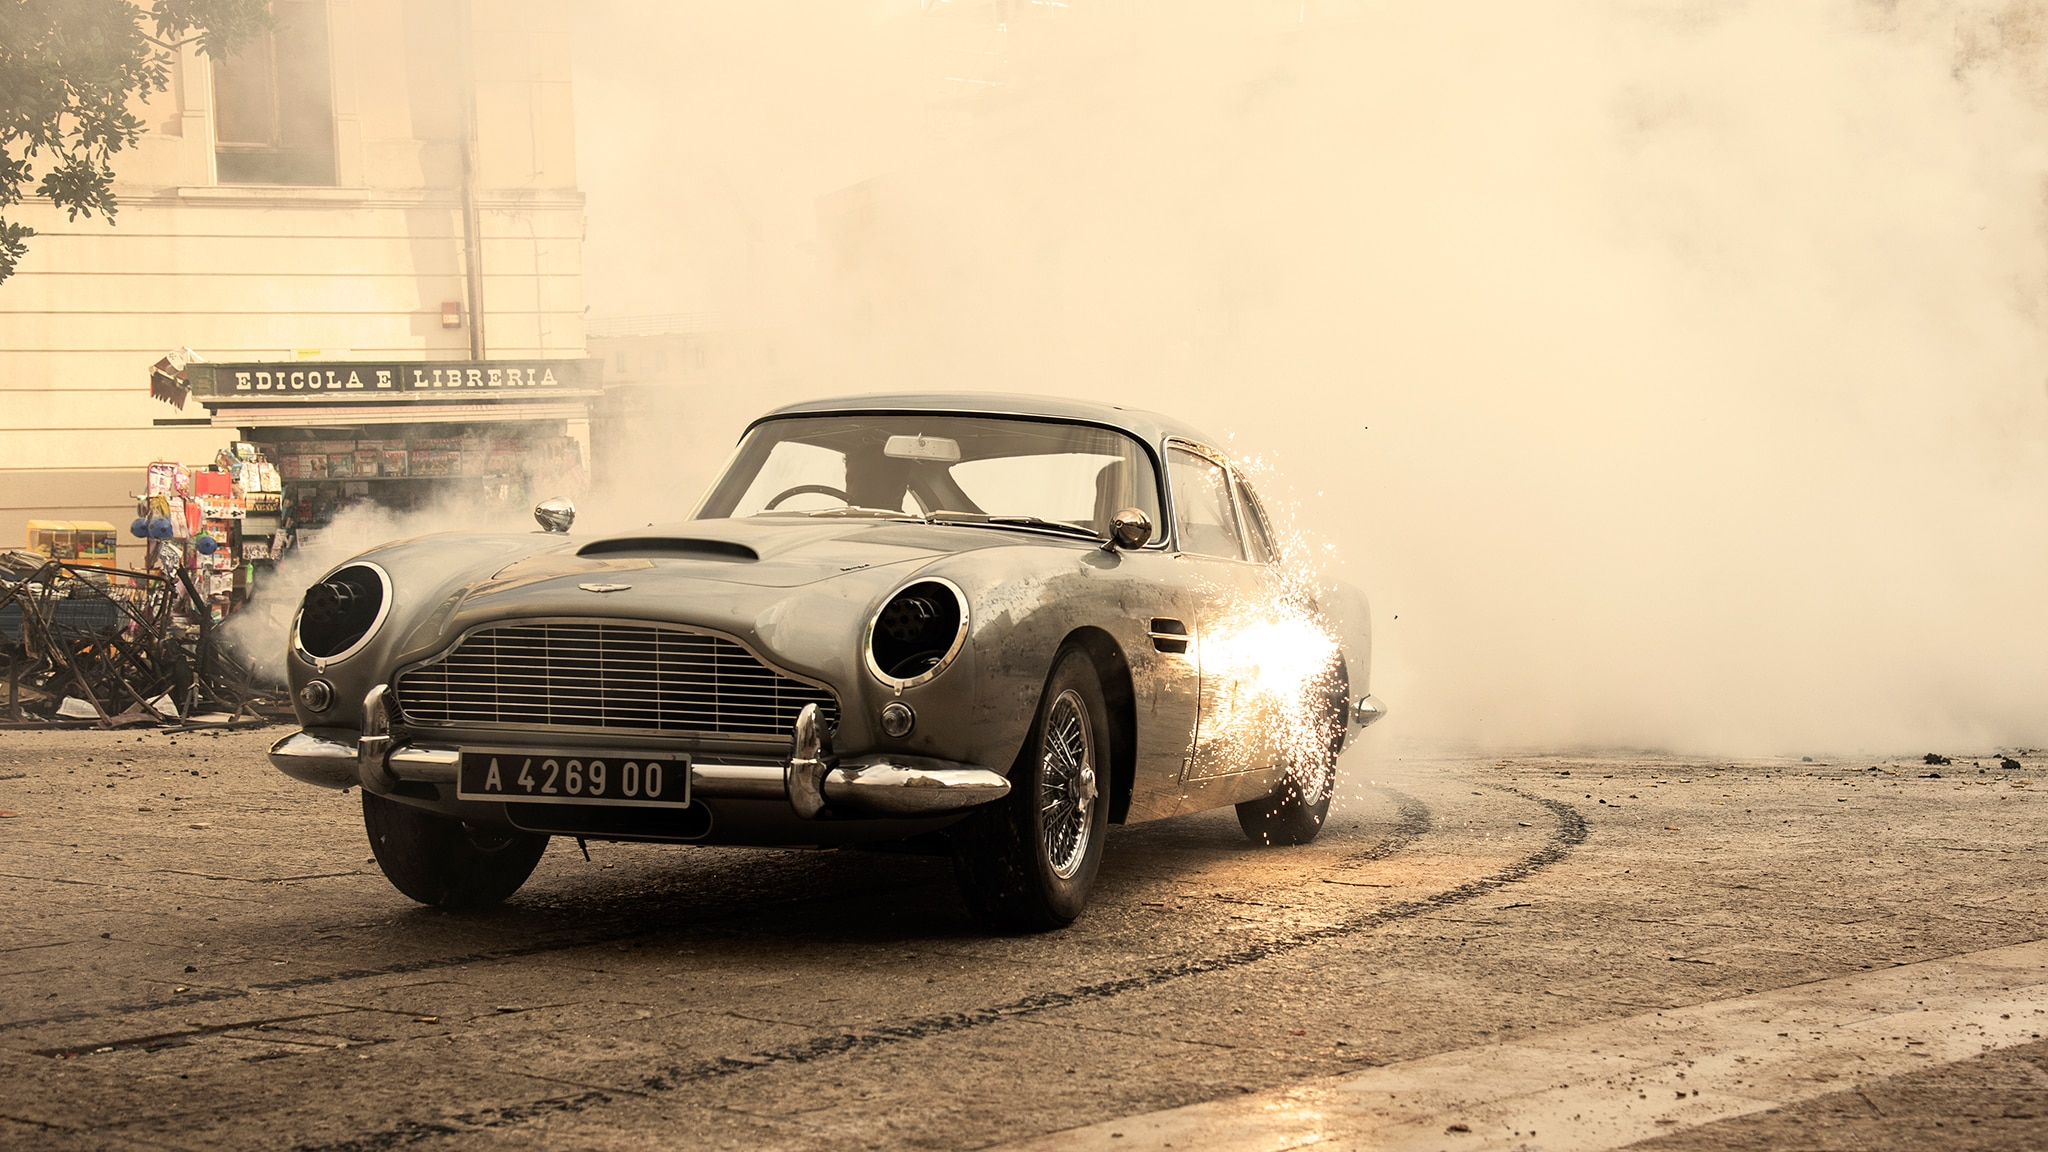 The 3 5 Million James Bond Aston Martin Db5 Gets Wild On The Set Of No Time To Die